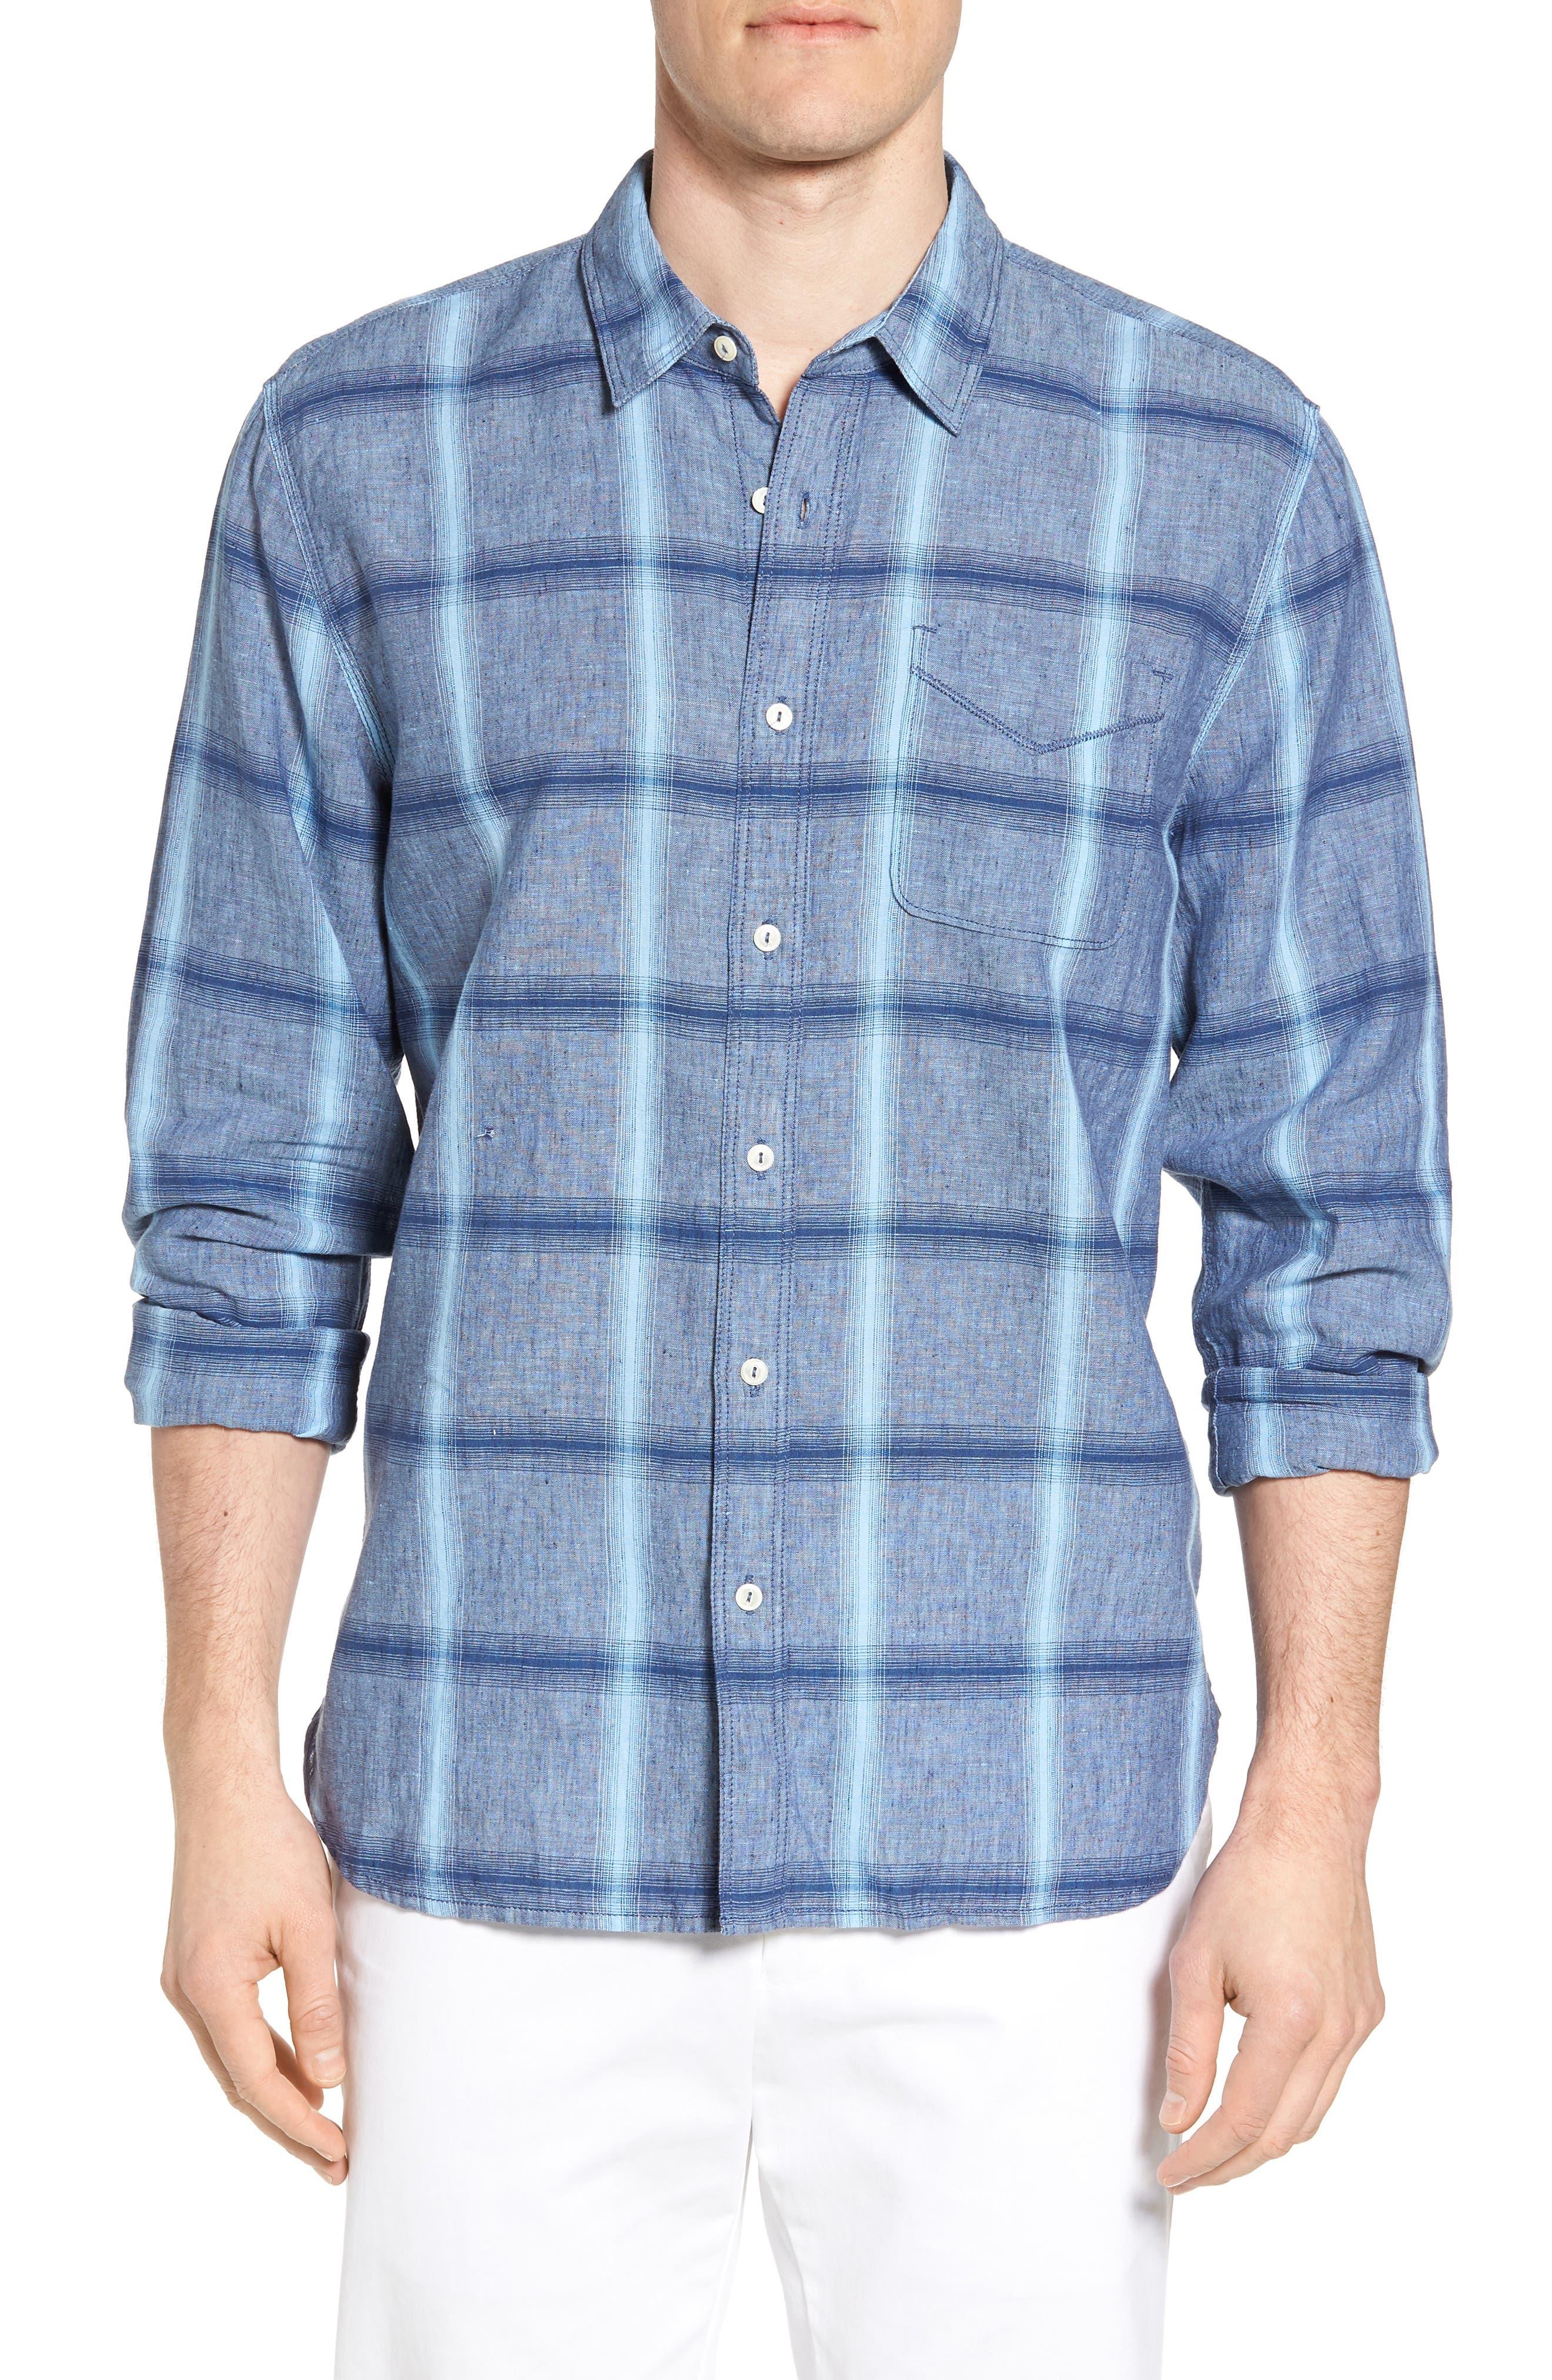 Alternate Image 1 Selected - True Grit Rincon Plaid Linen Blend Chambray Sport Shirt